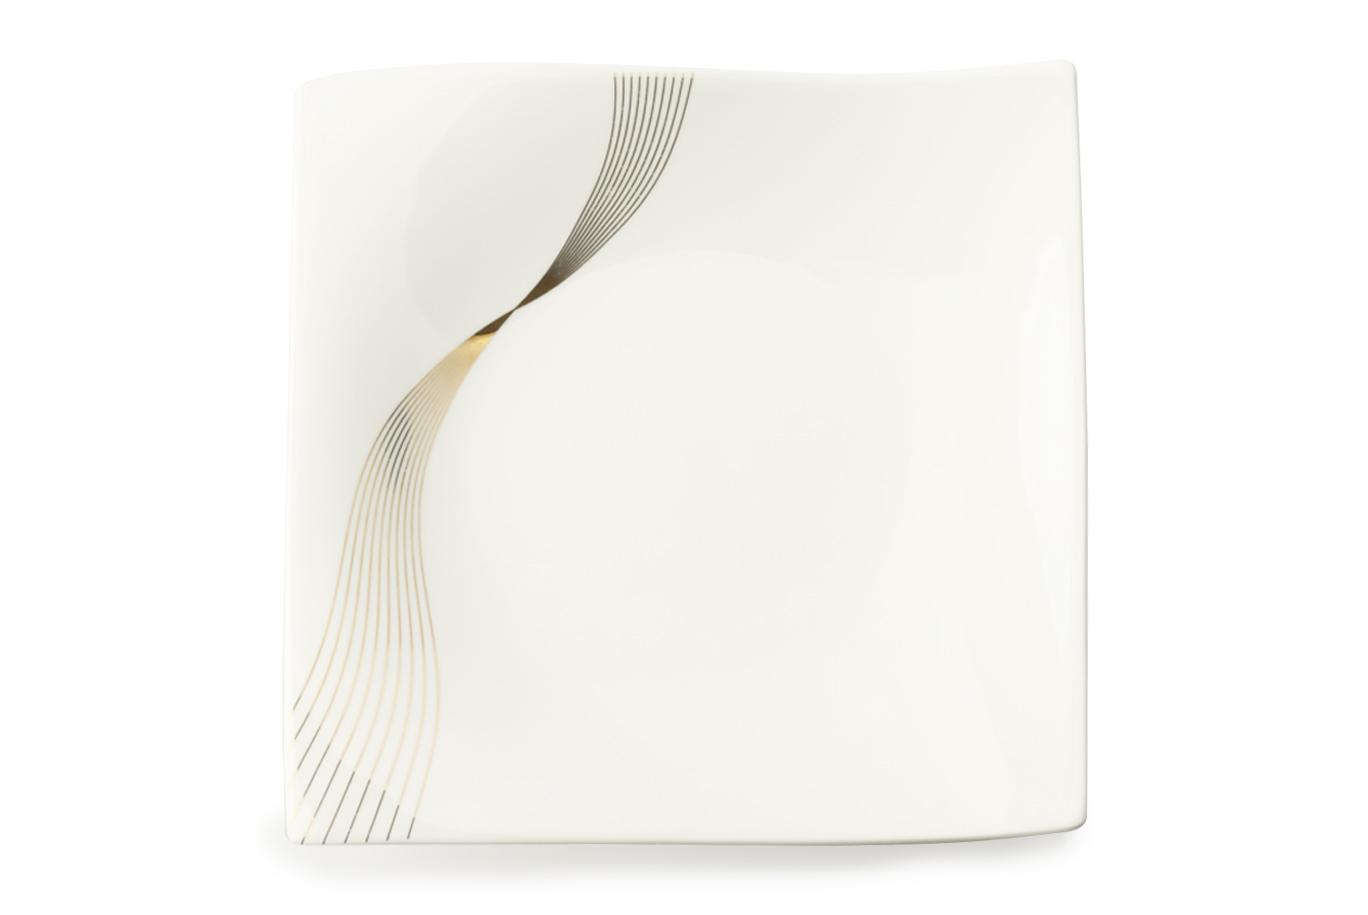 Čtvercový dezertní talíř Frequency 18 x 18 cm - Maxwell&Williams